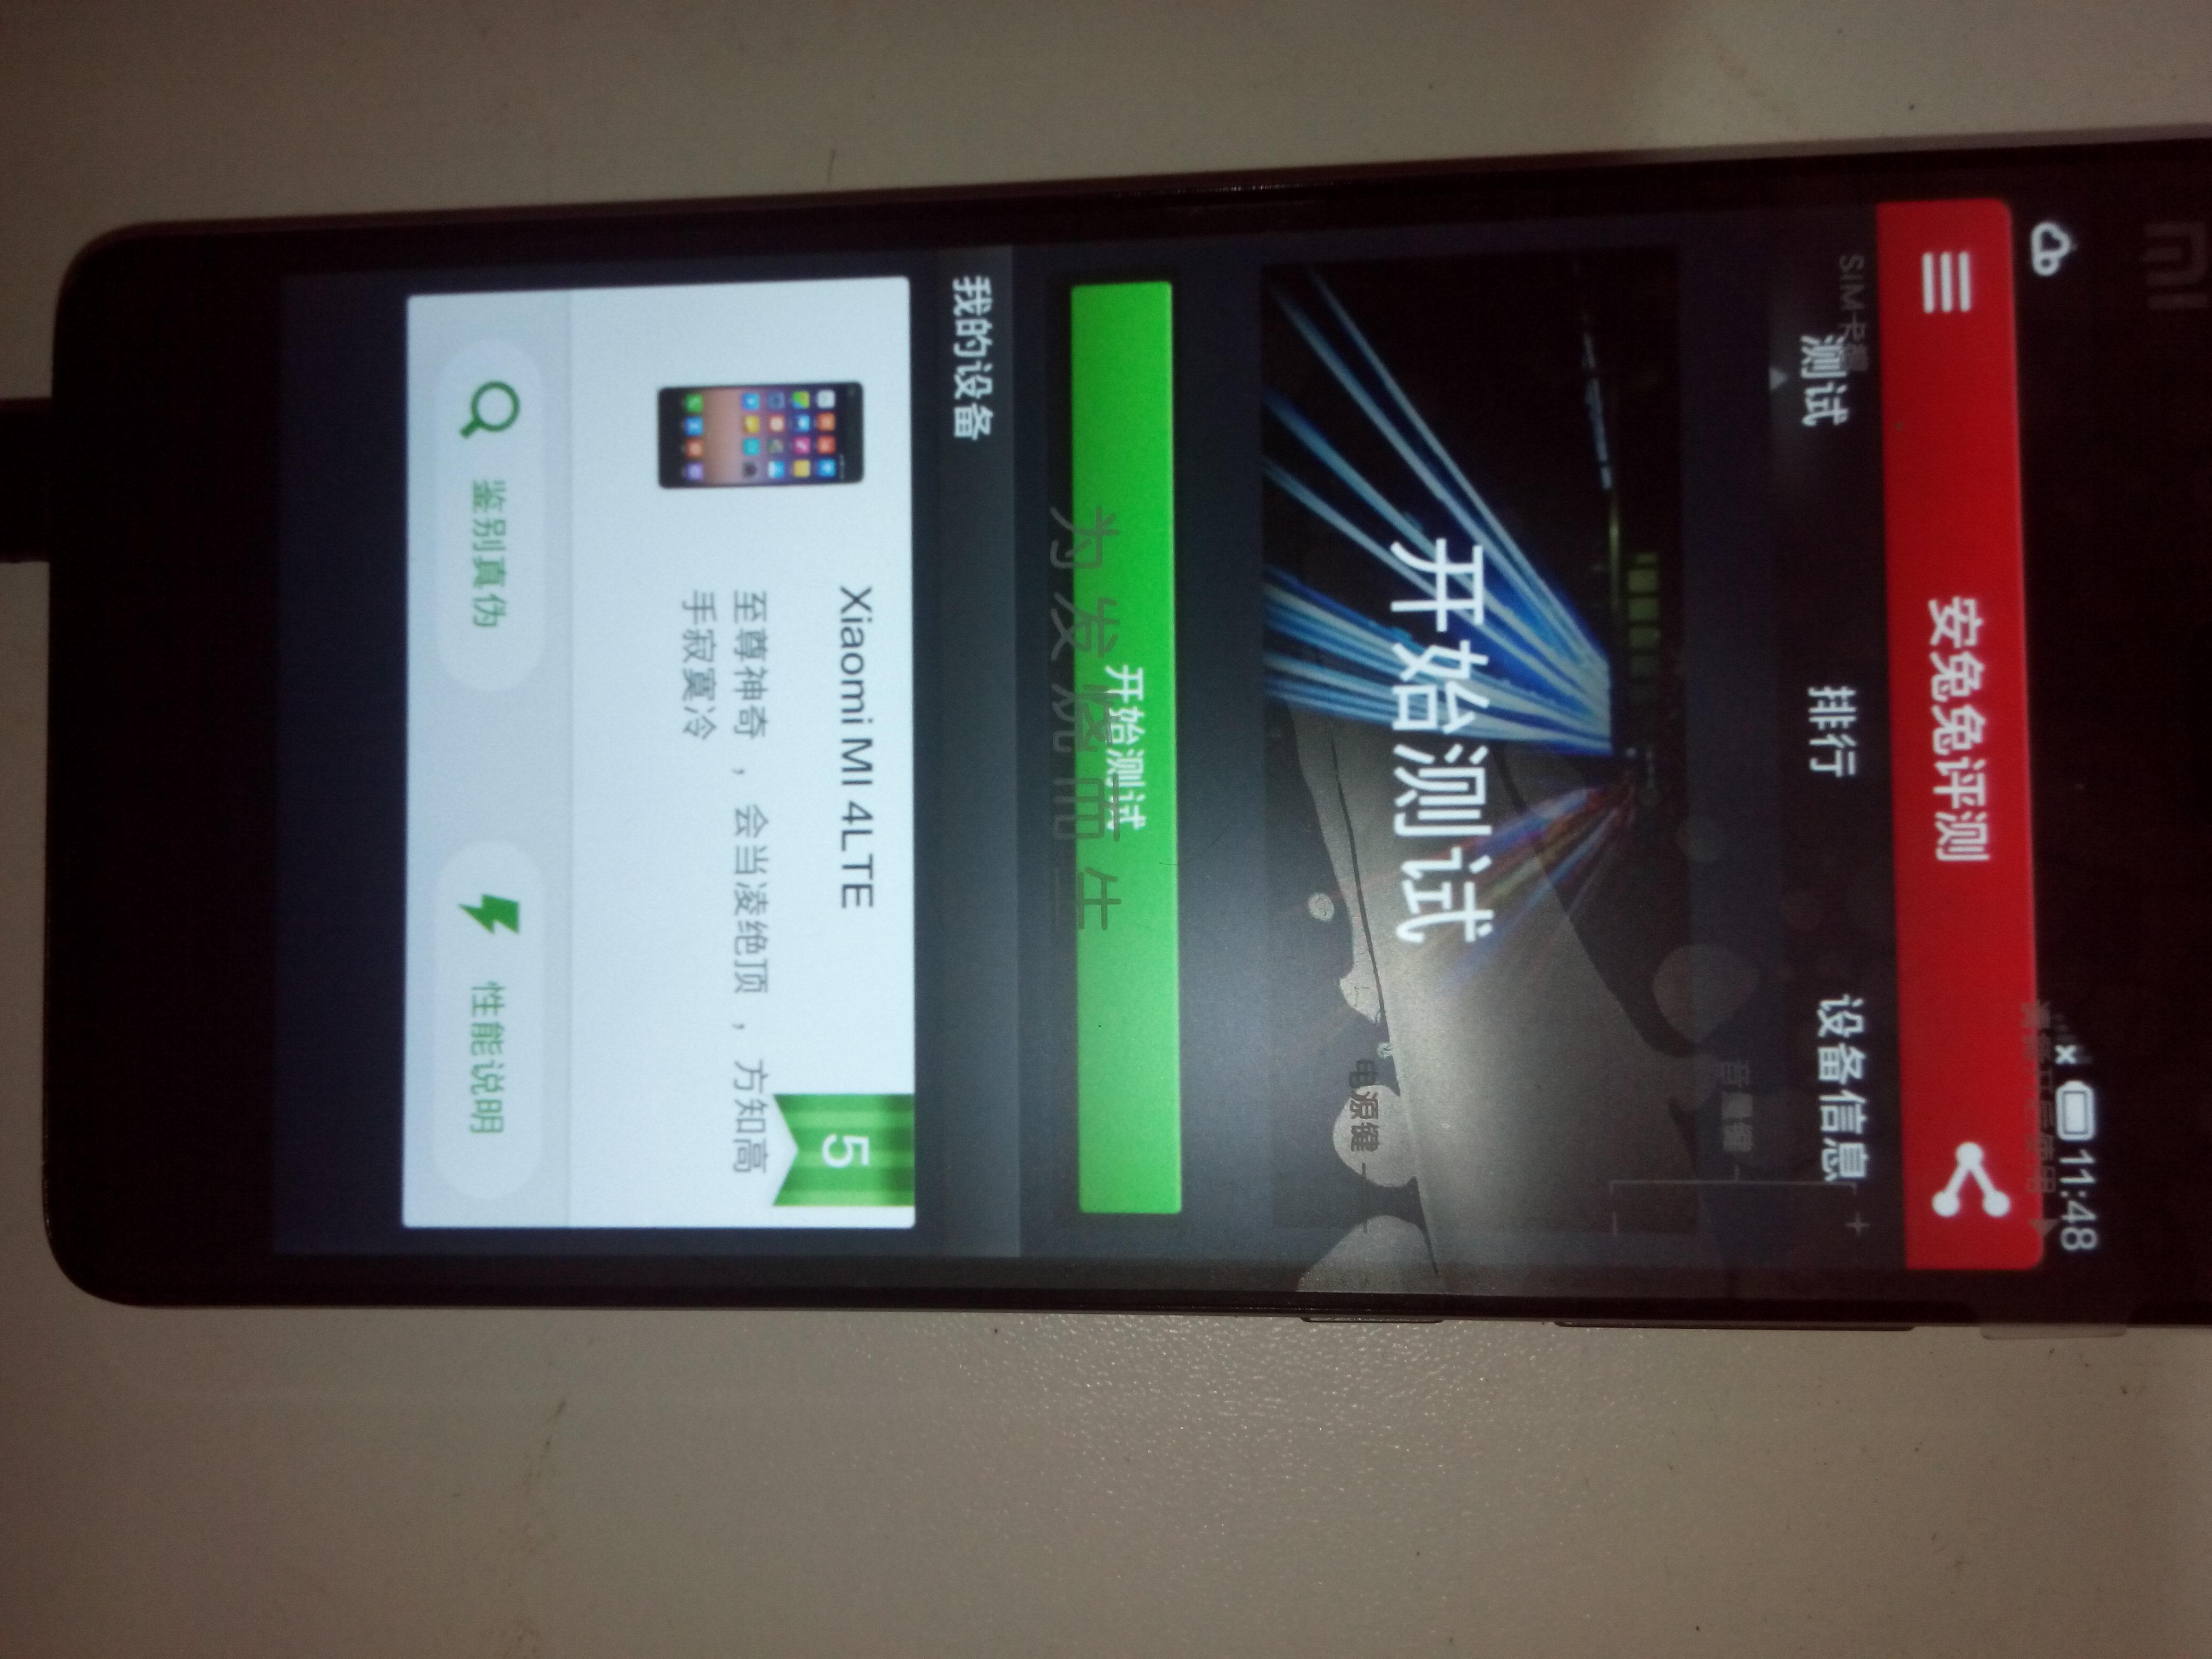 Fastboot mode on Xiaomi MI4 TD-LTE | Xiaomi European Community